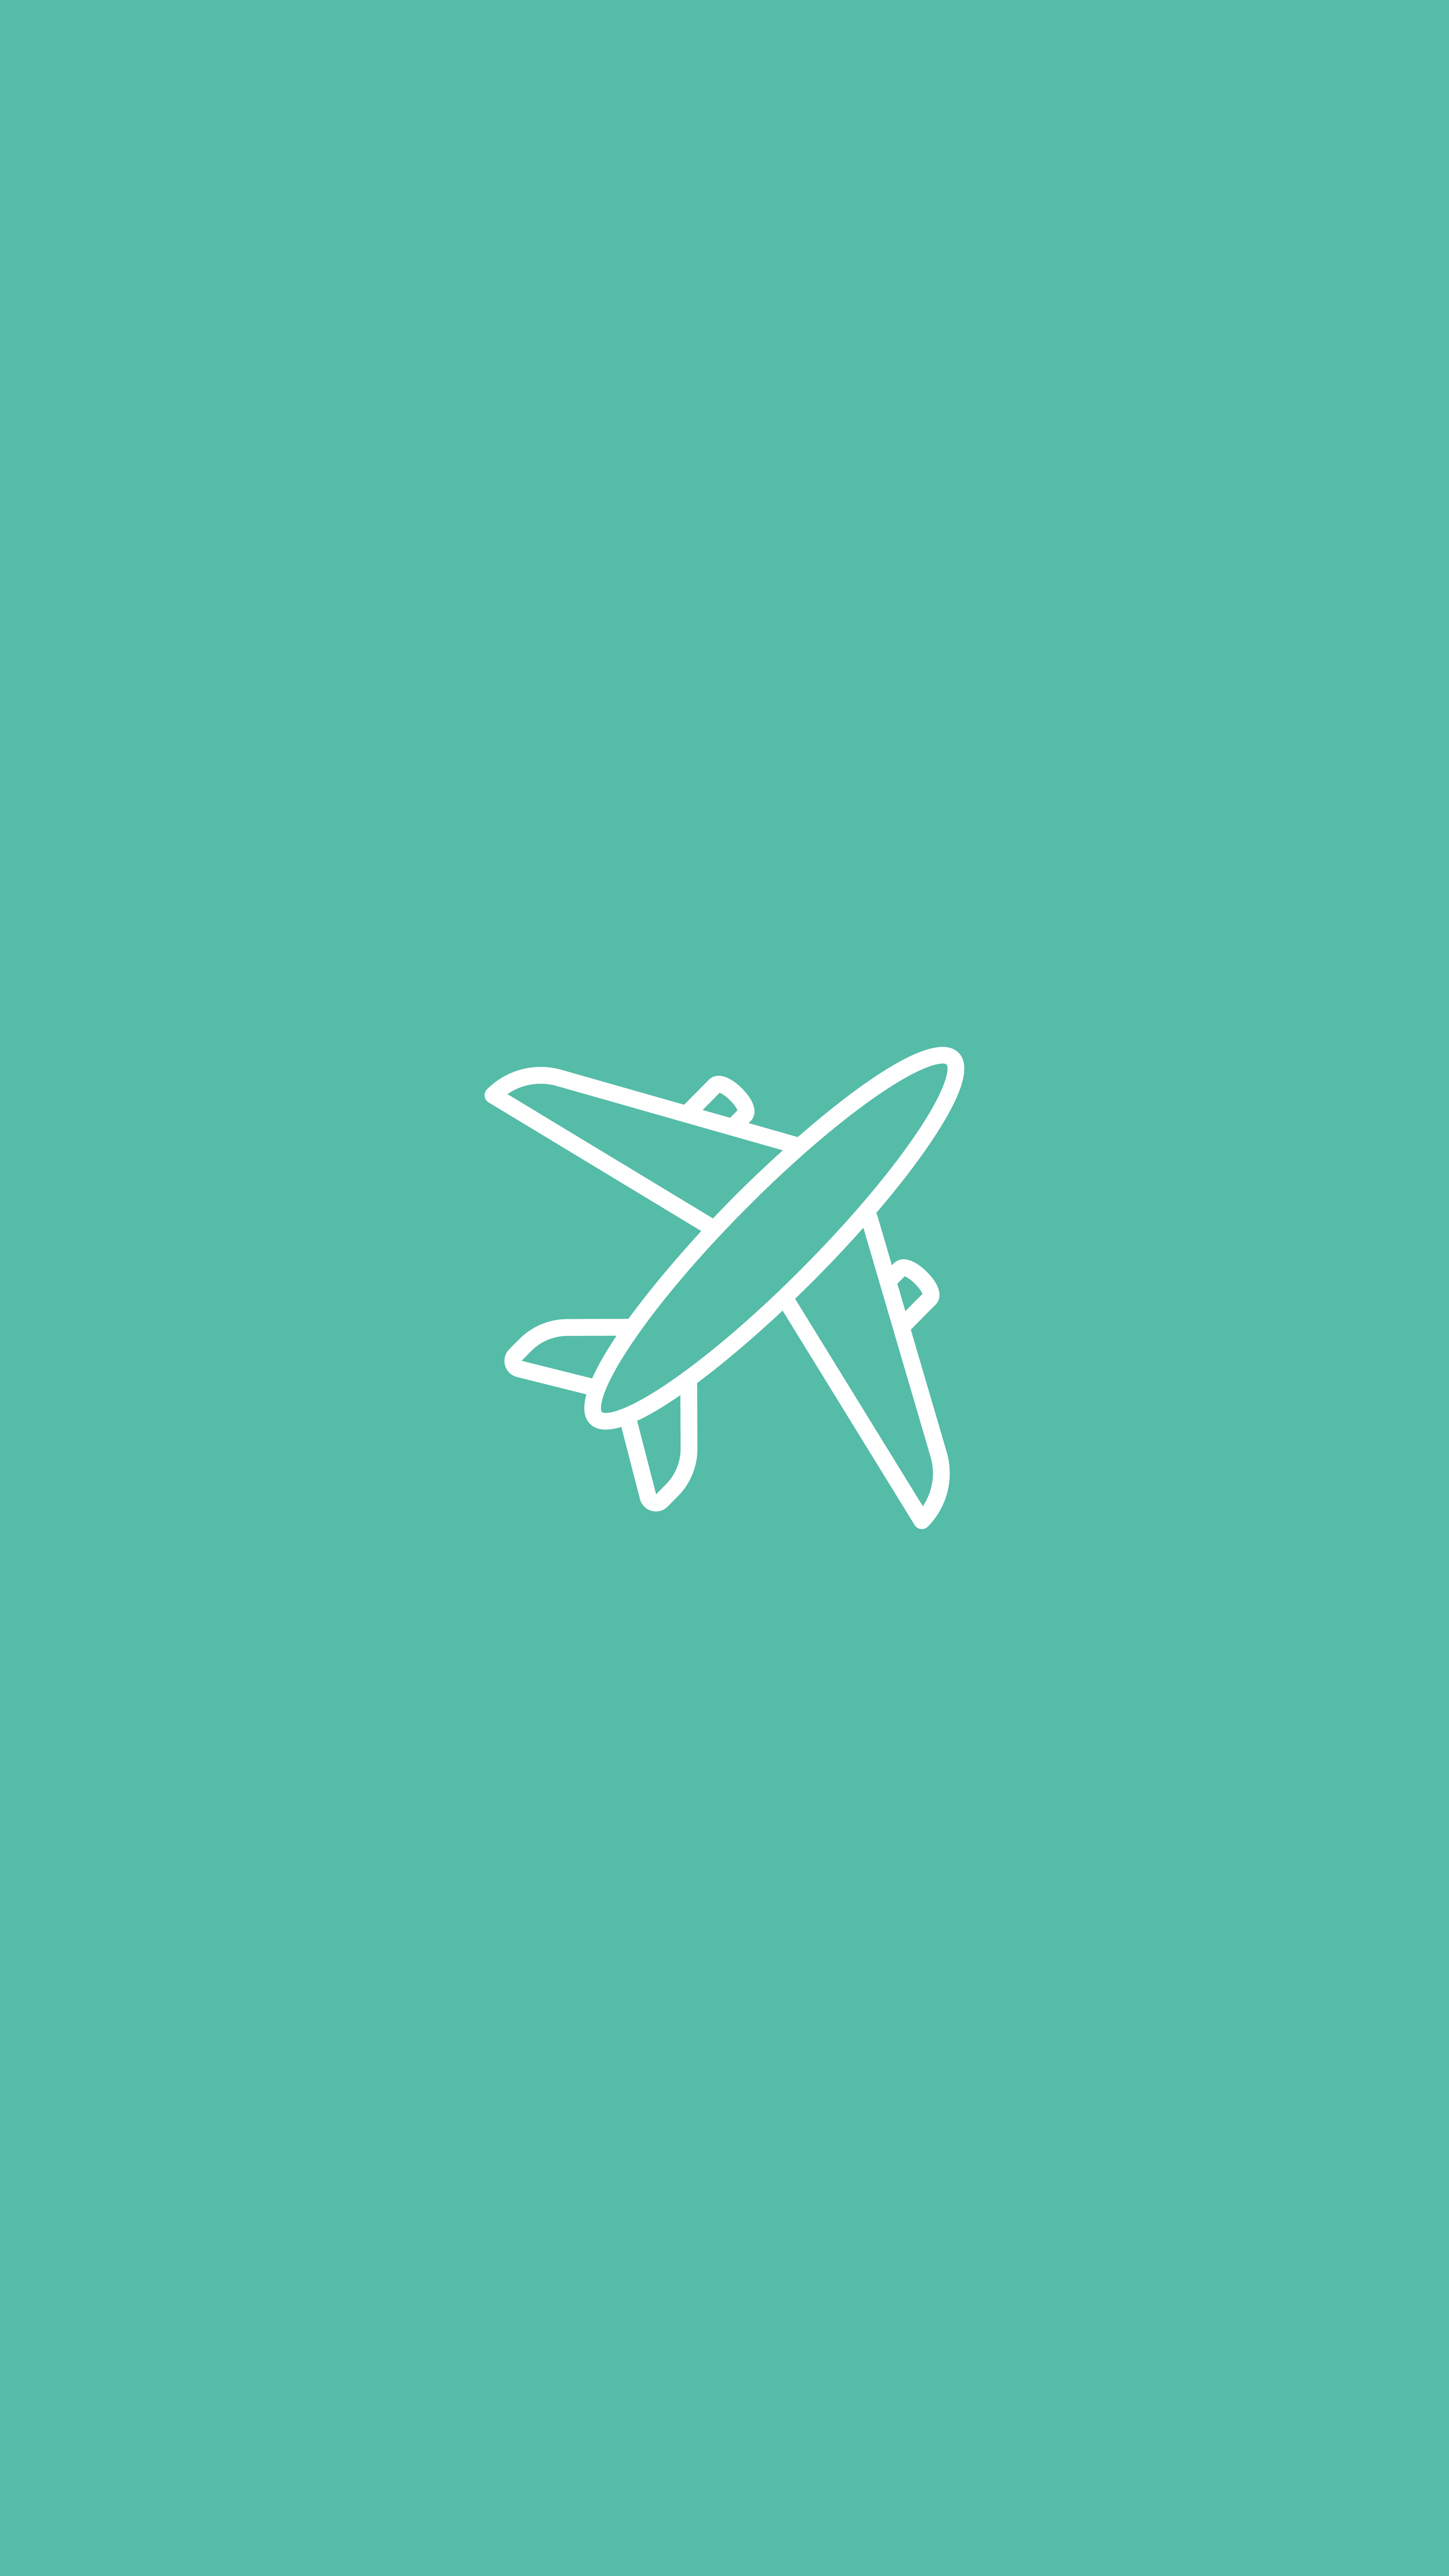 Travel, Airplane, Vacation, Trip